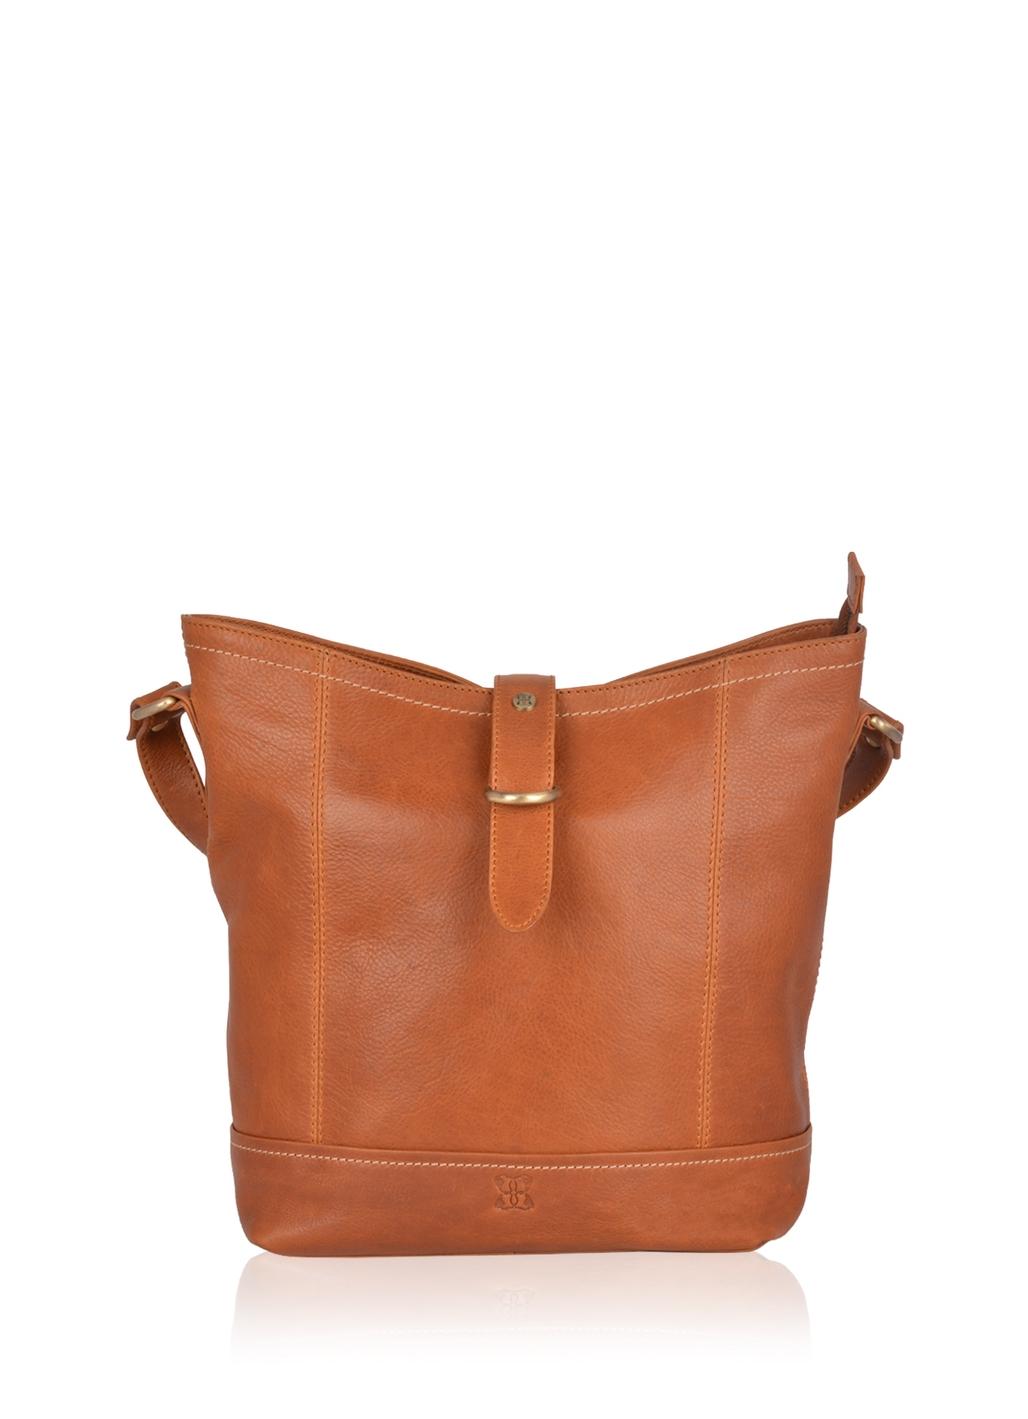 Allonby Leather Shoulder Bag in Tan